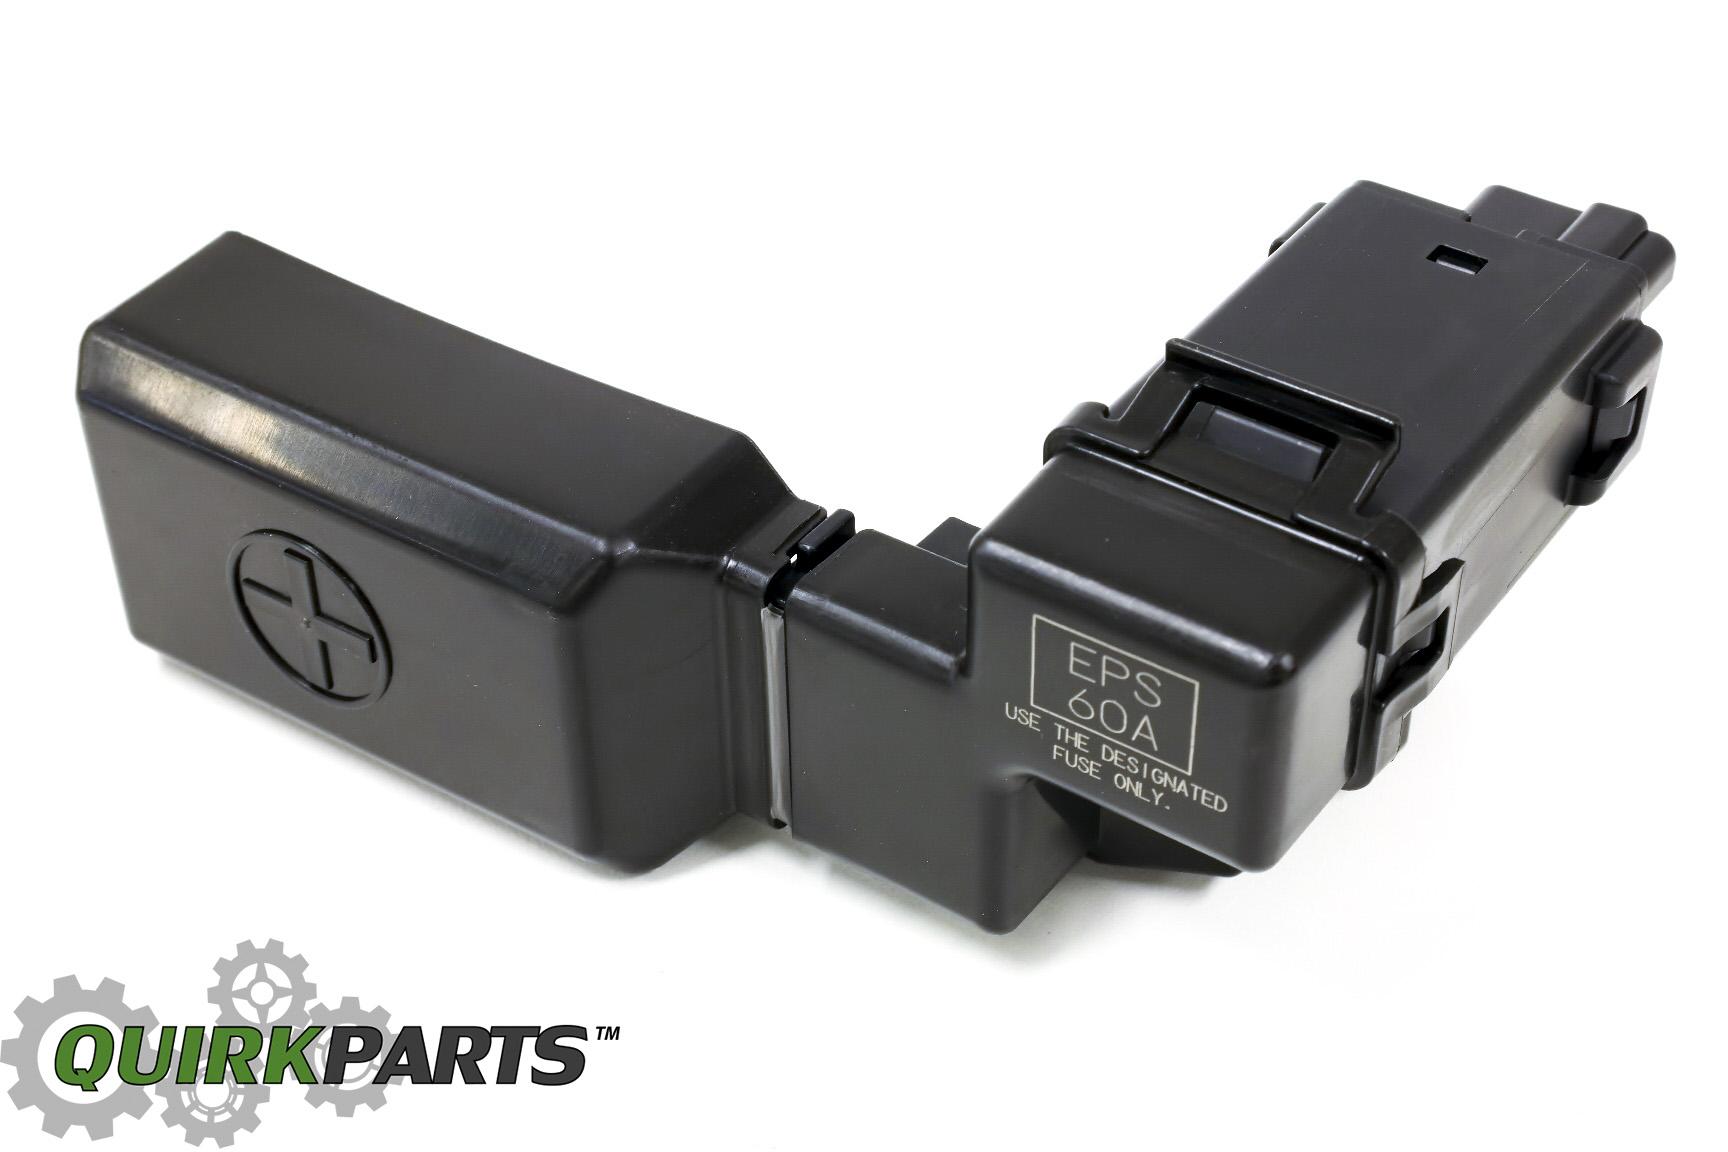 2004 Mazda Rx8 Main Fuse Complete Wiring Diagrams Rx 8 Box Diagram 2011 Battery Terminal Block Oem F154 66 Rh Ebay Co Uk Problems